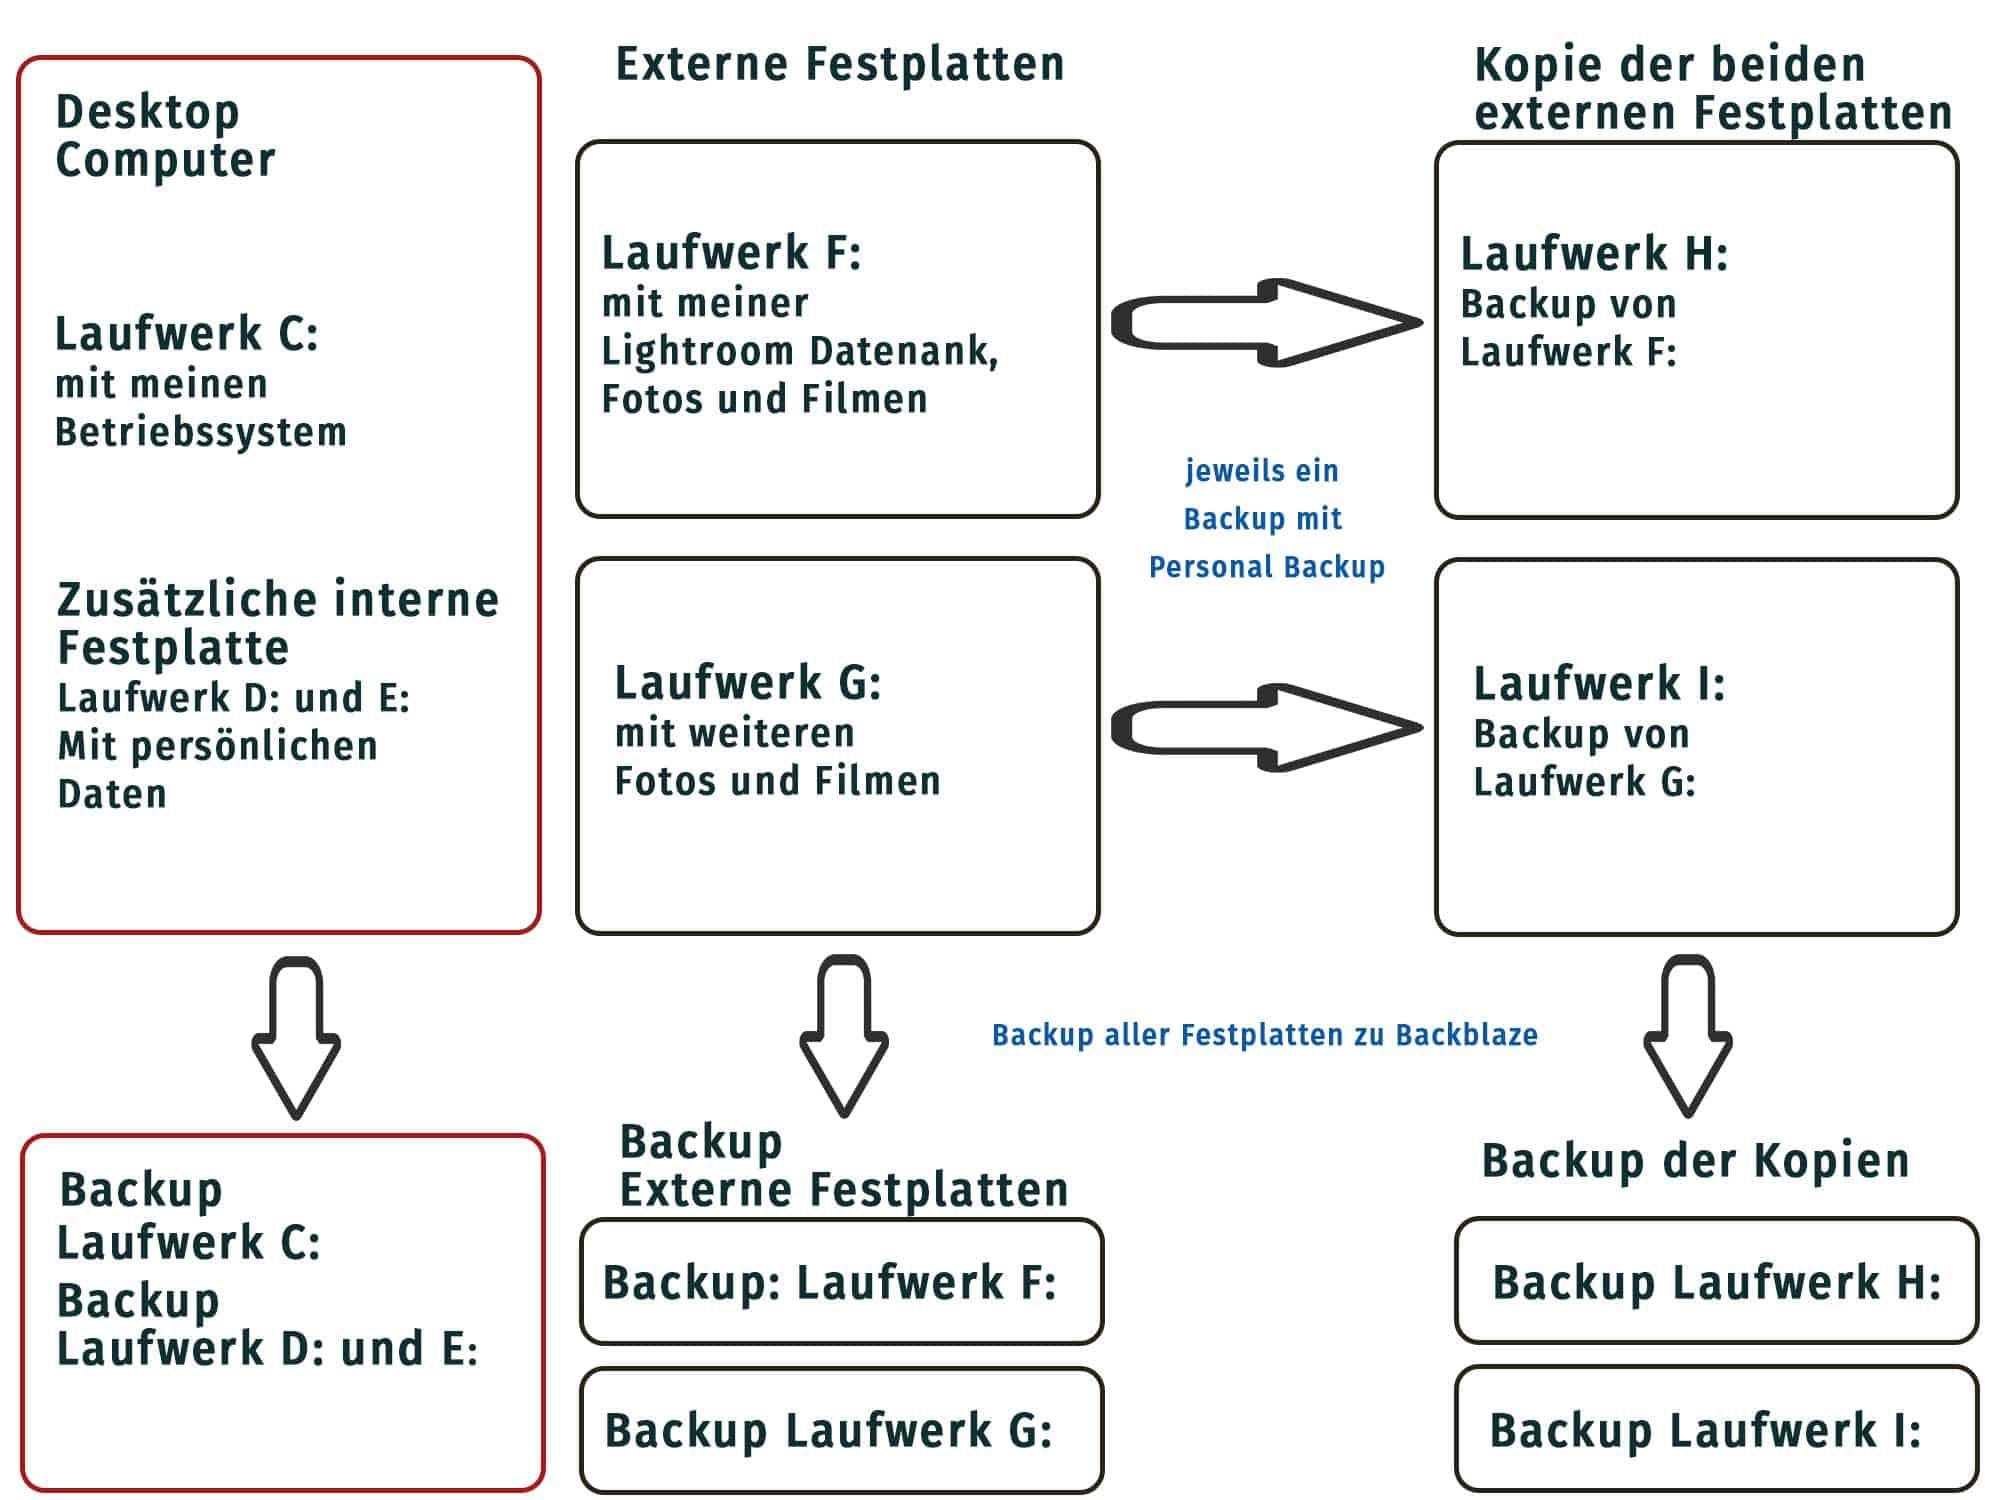 Backupsystem